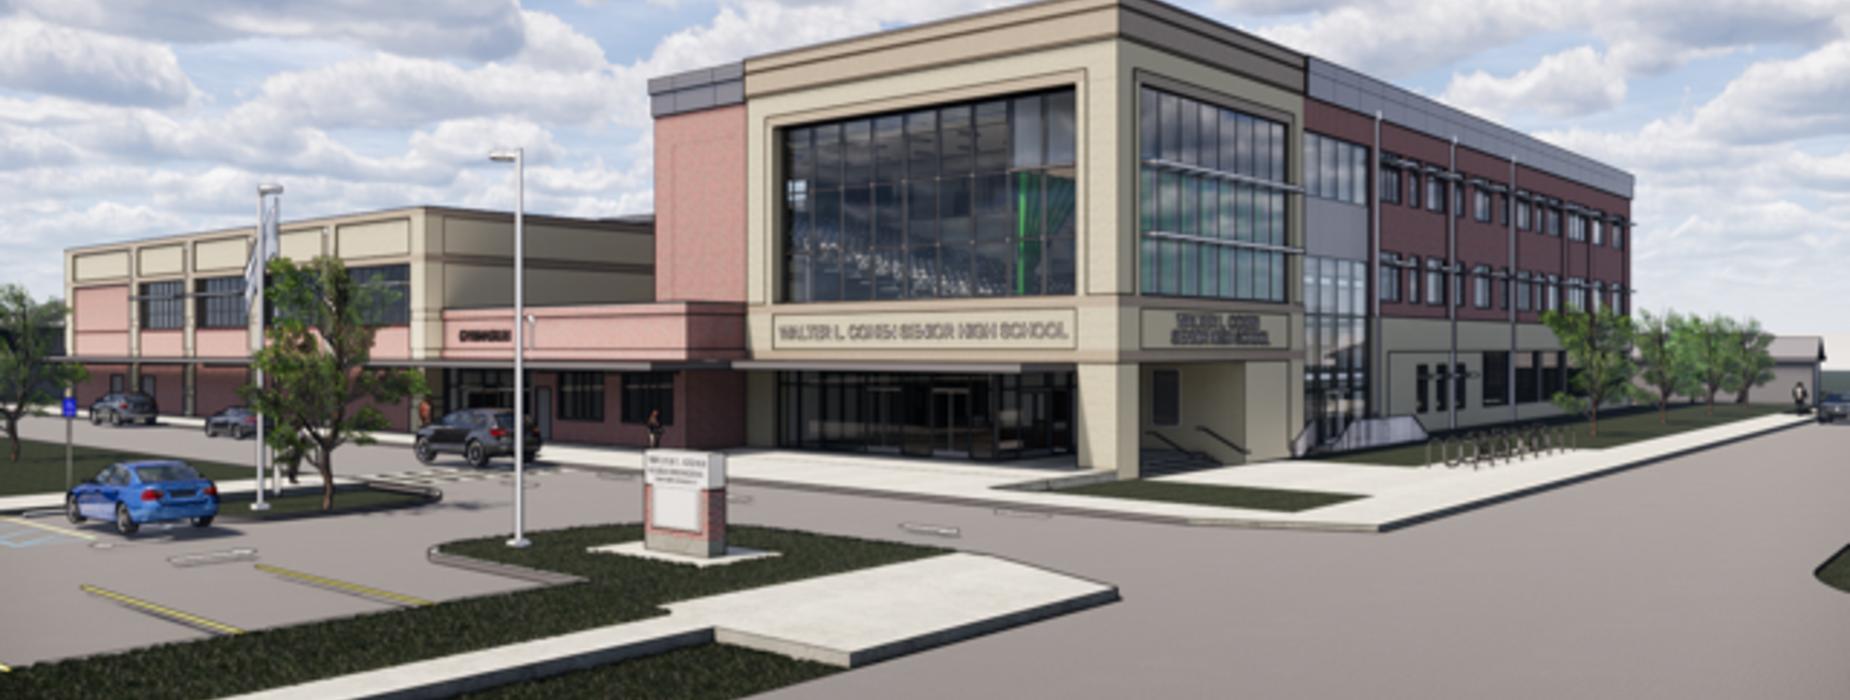 Renderings of new Cohen campus